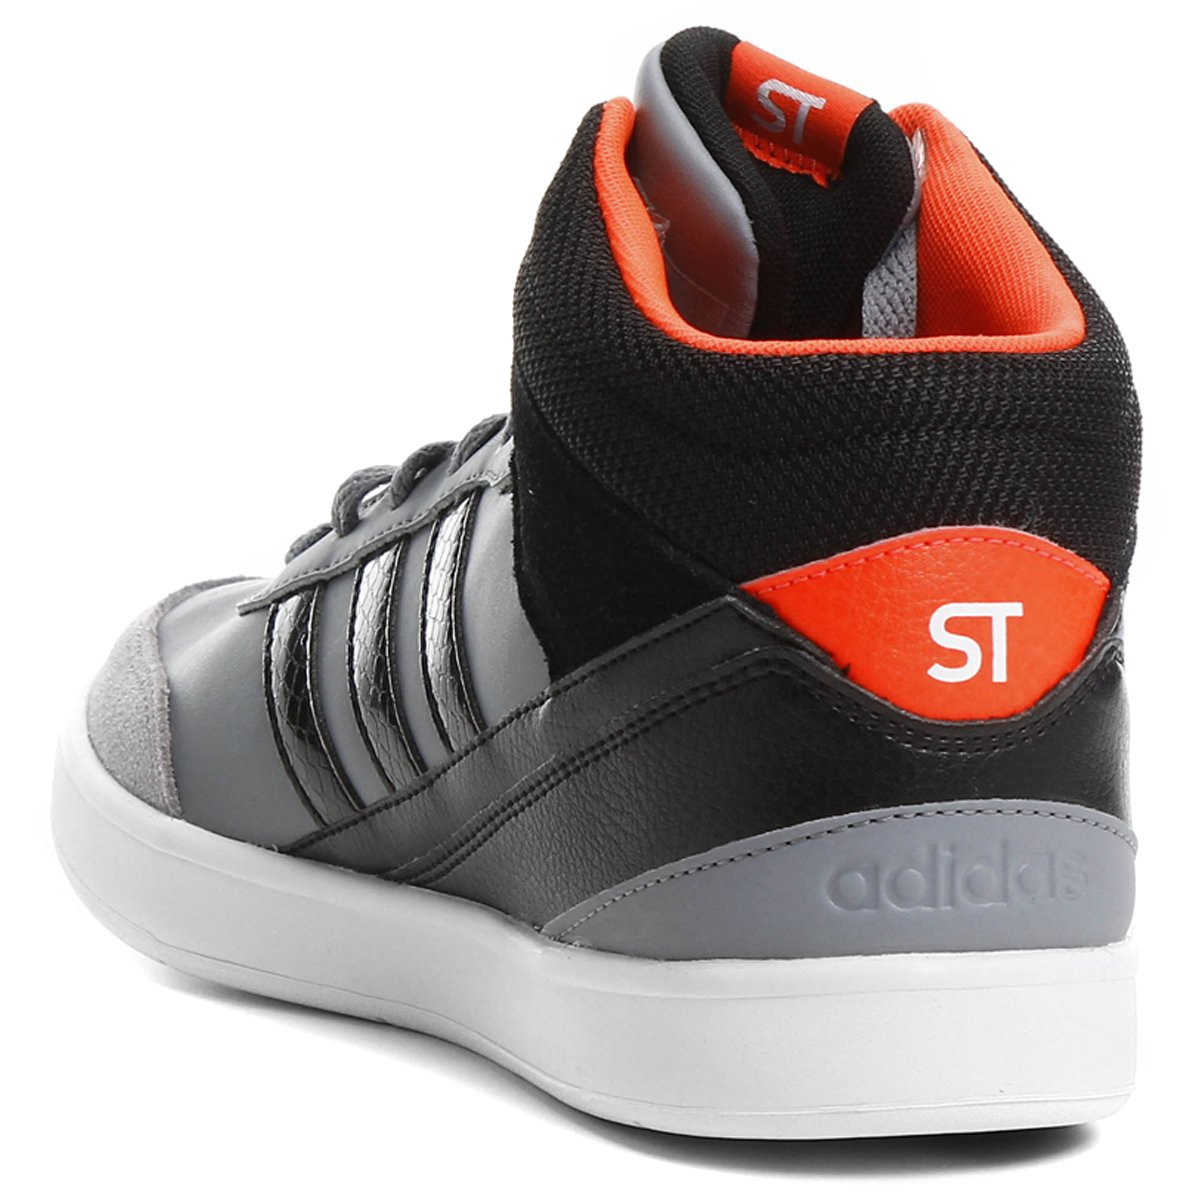 2465d8043c0 Tênis Adidas Park St Kflip Mid - Compre Agora